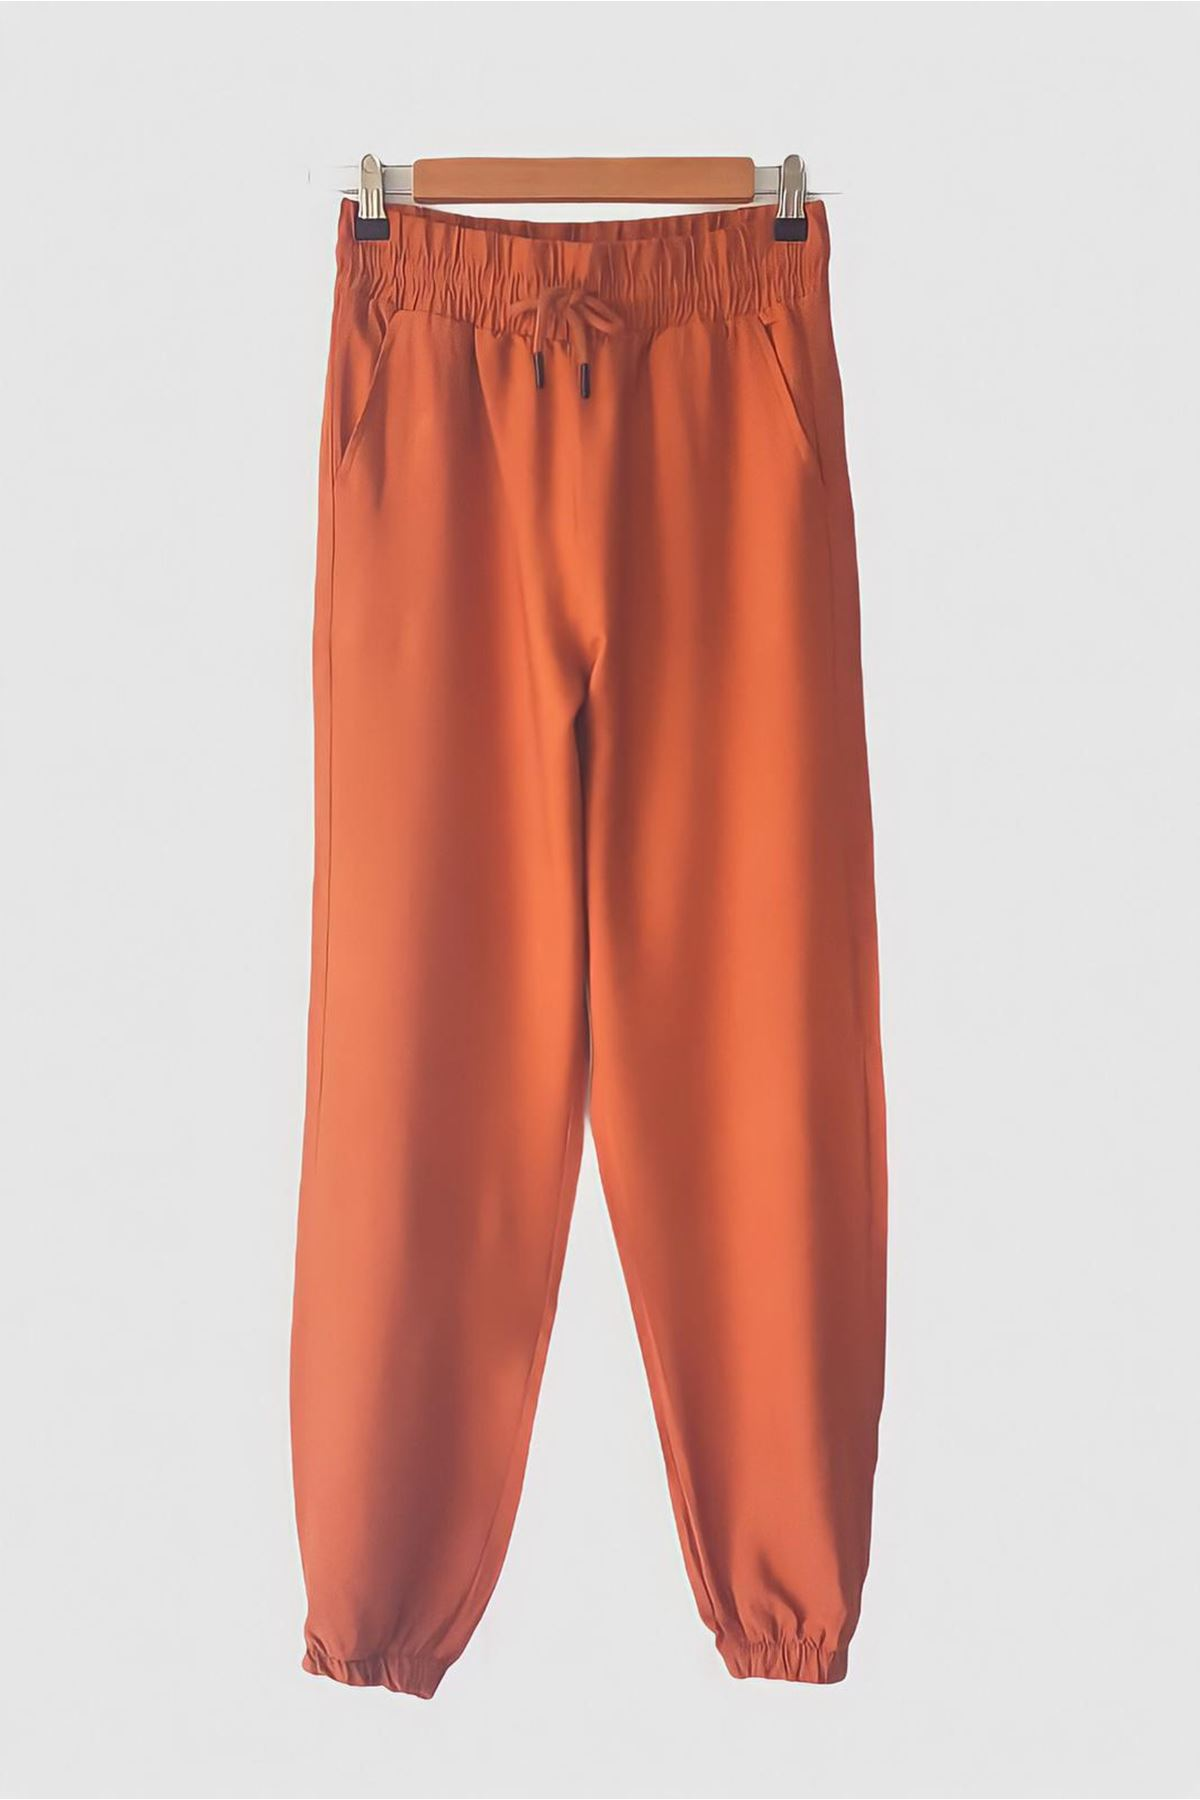 Ayrobin kumaş Jogger Pantolon - KİREMİT